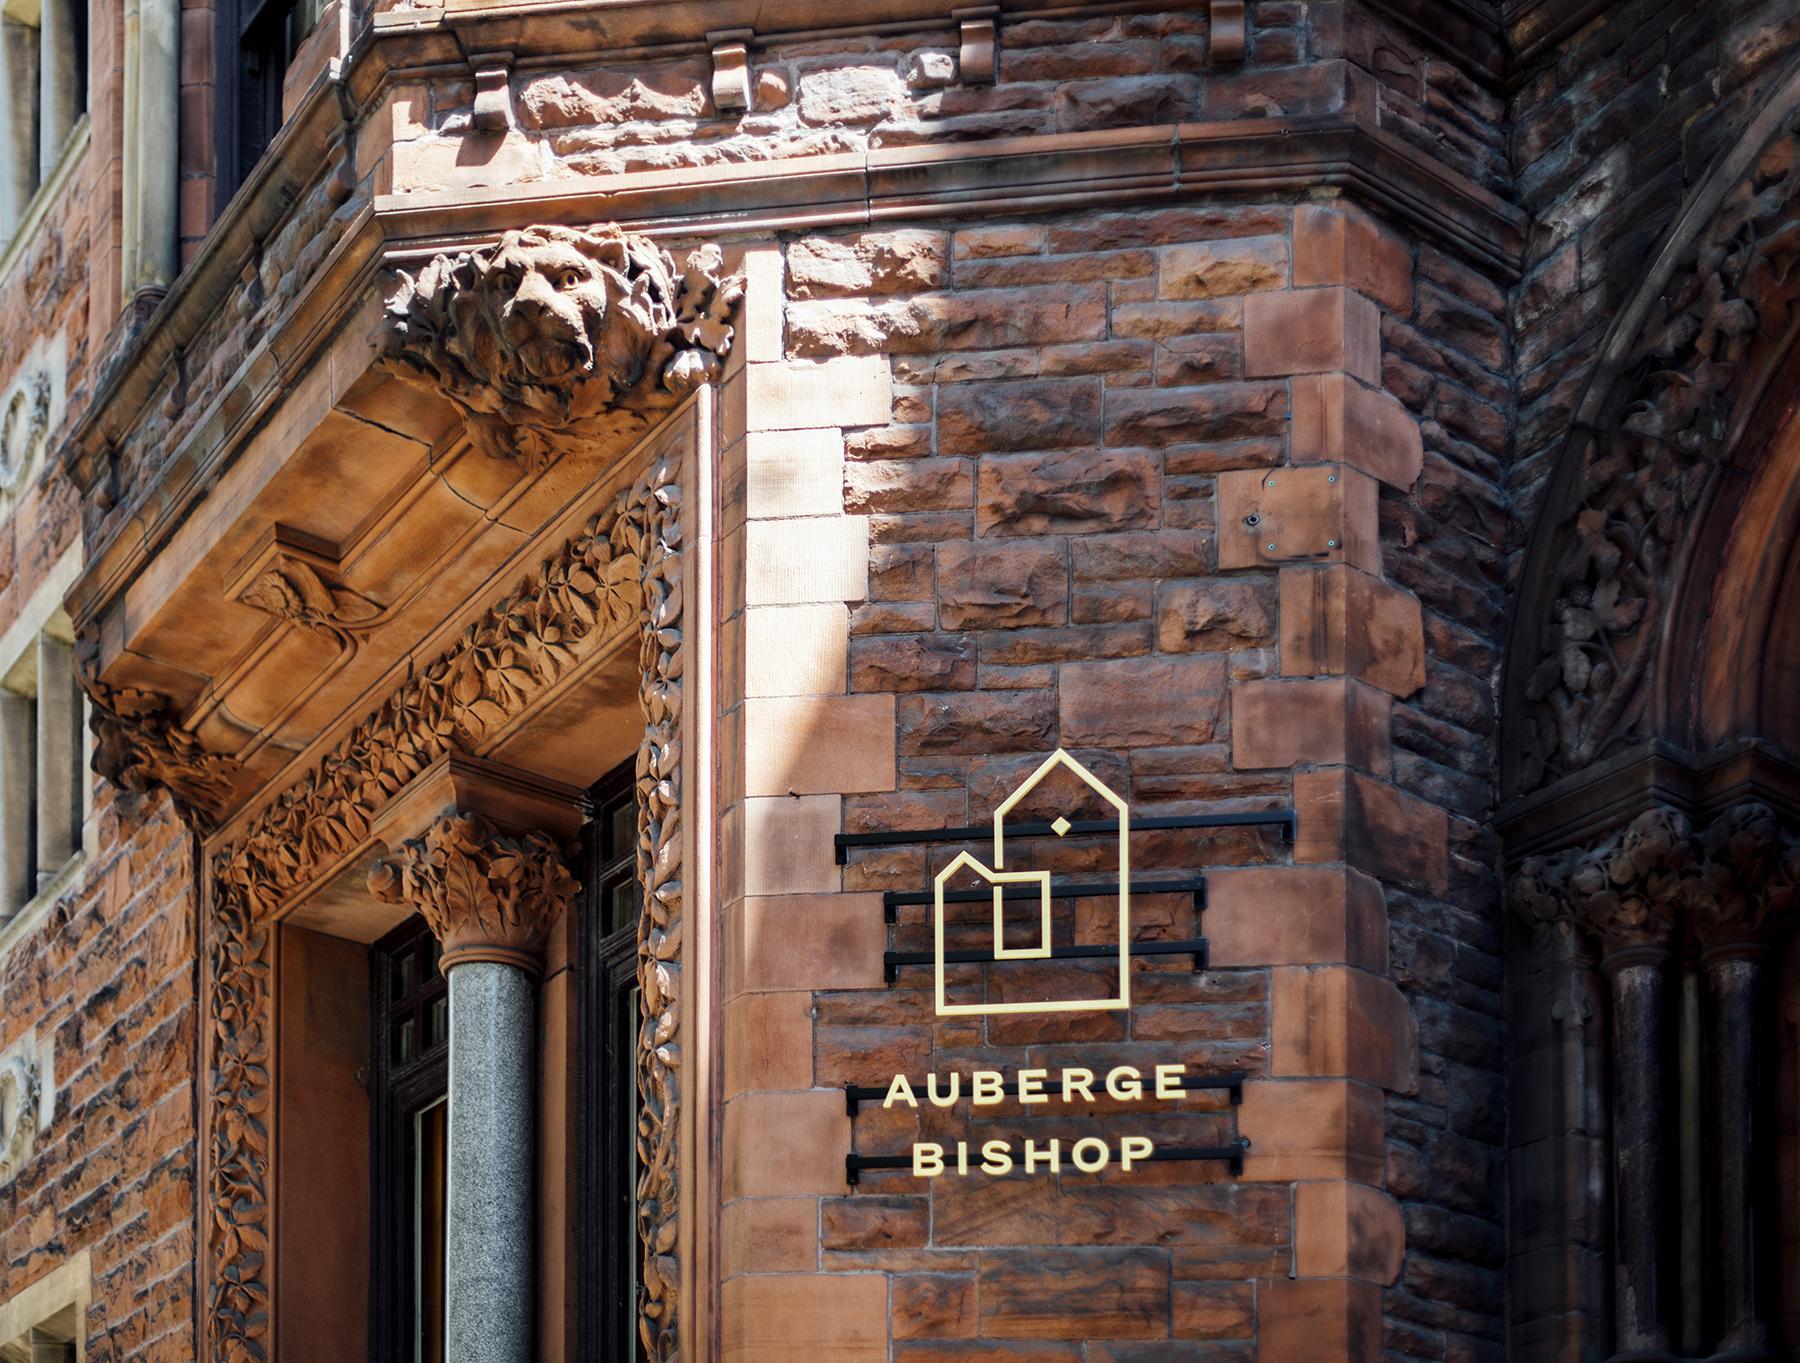 Hostel Auberge Bishop